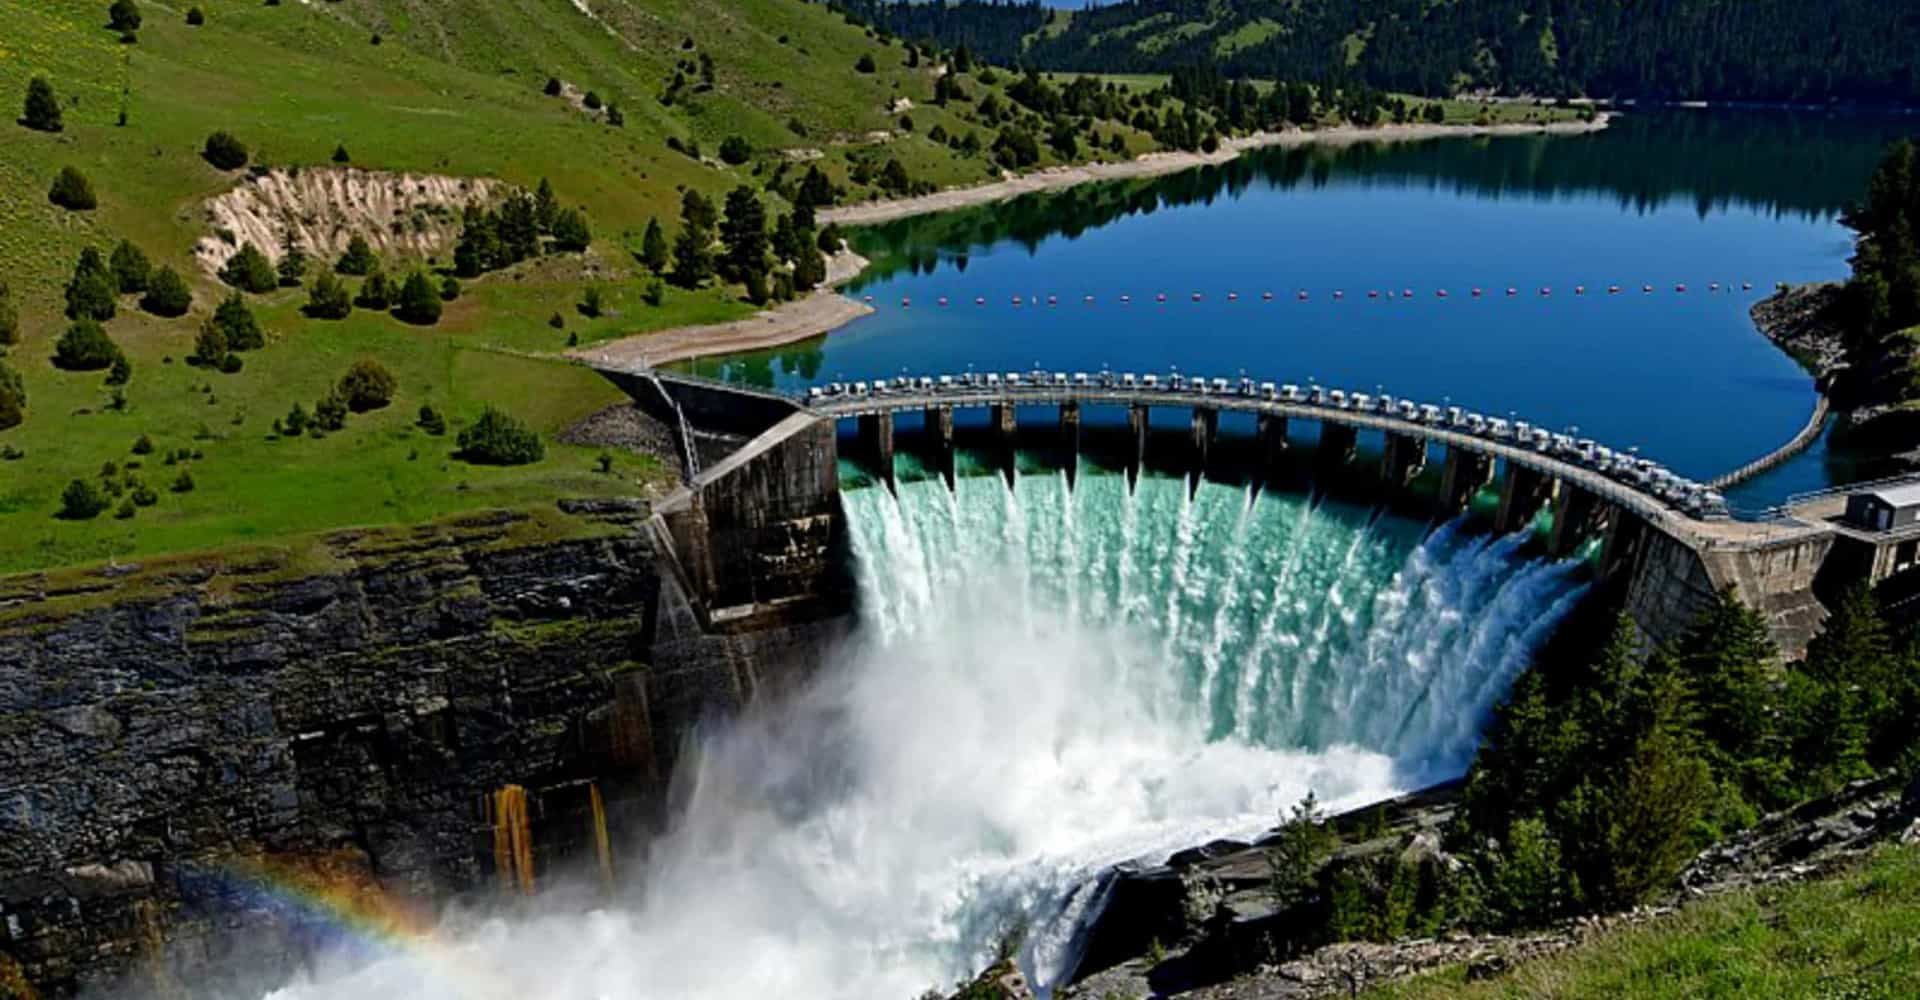 World wonders: Impressive dams across the globe